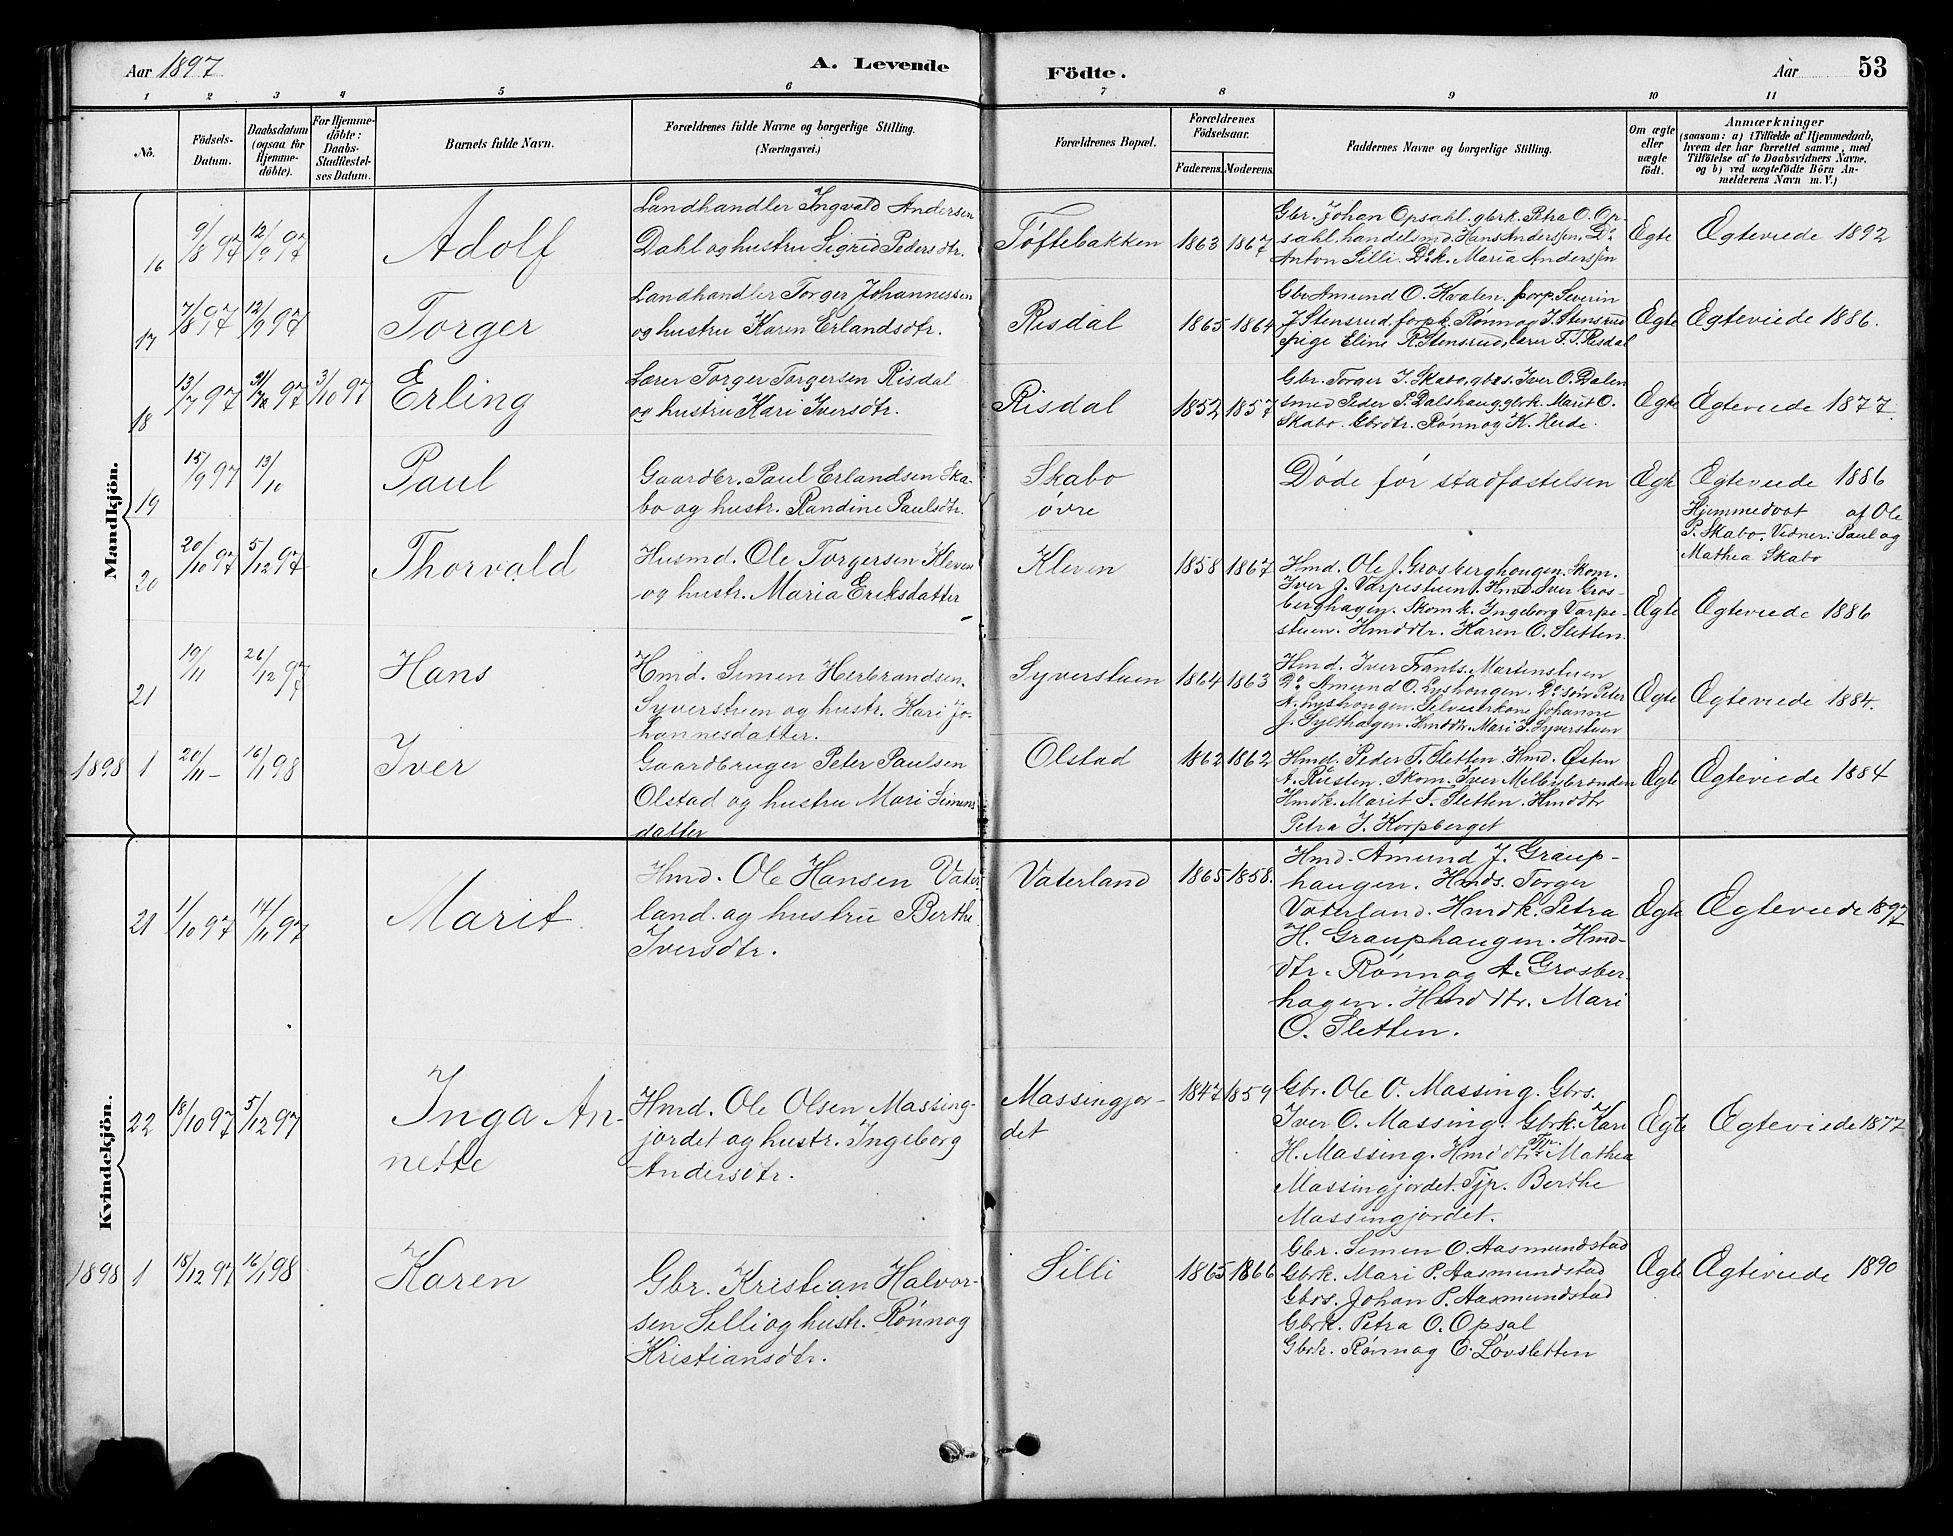 SAH, Nord-Fron prestekontor, Klokkerbok nr. 5, 1884-1914, s. 53